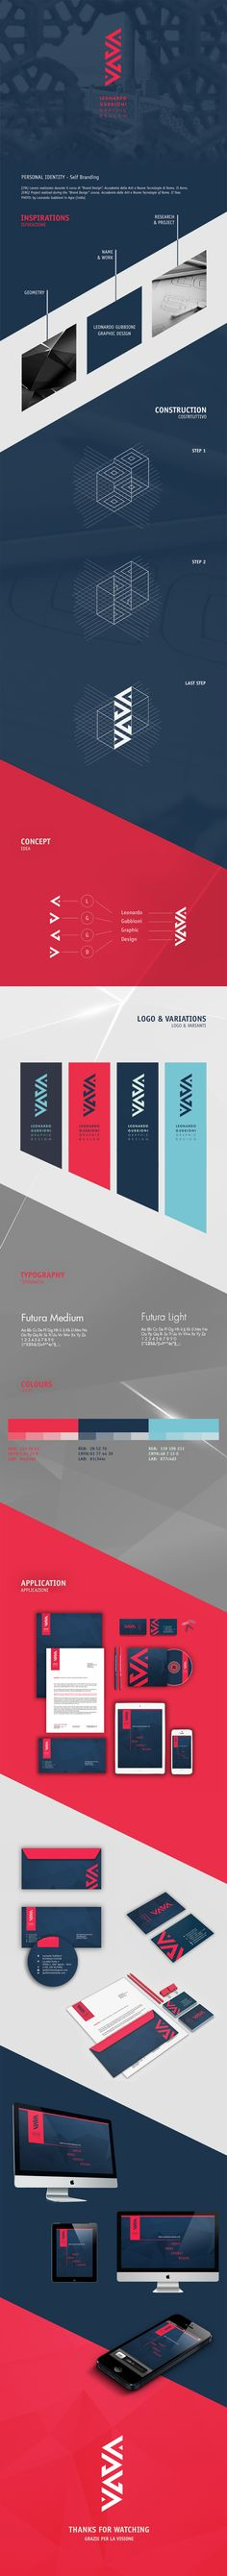 Inspirational Logos Design 2014 | Branded Logo Designs | Graphic Design Inspiration